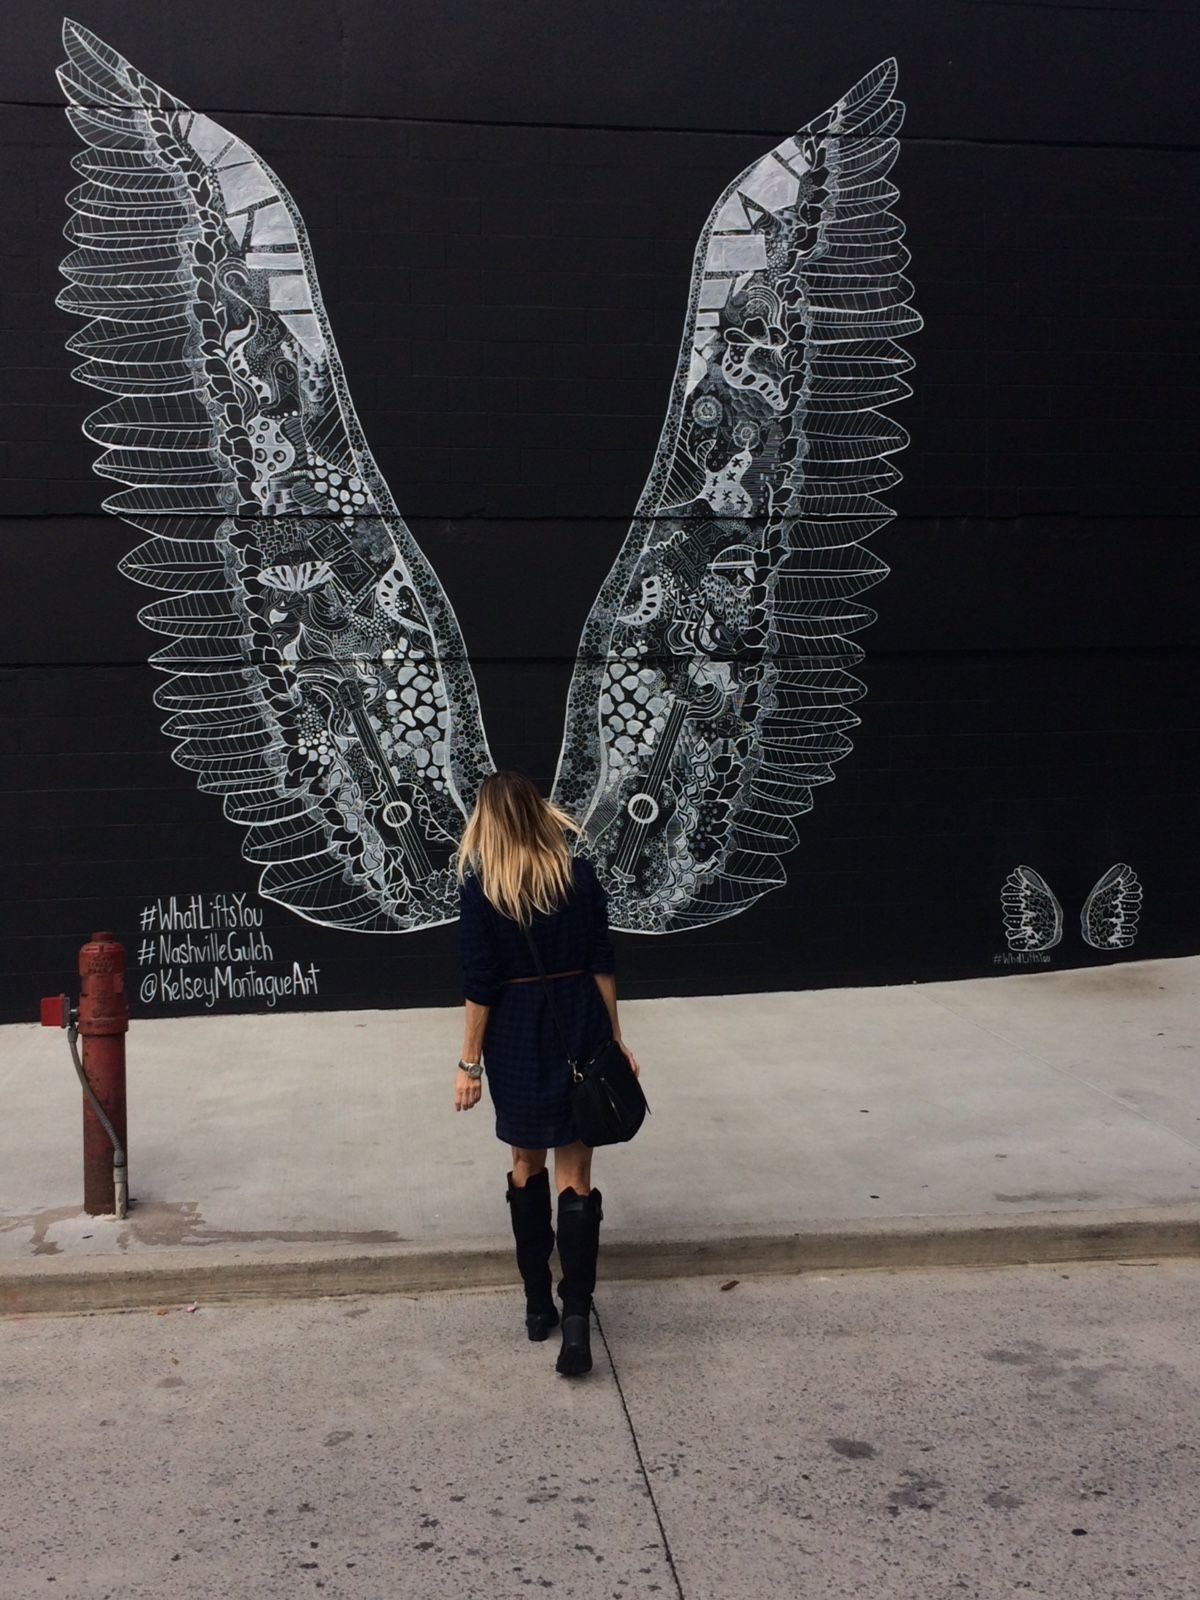 WhatLiftsYou Nashville, TN | adventures  in 2019 | Nashville